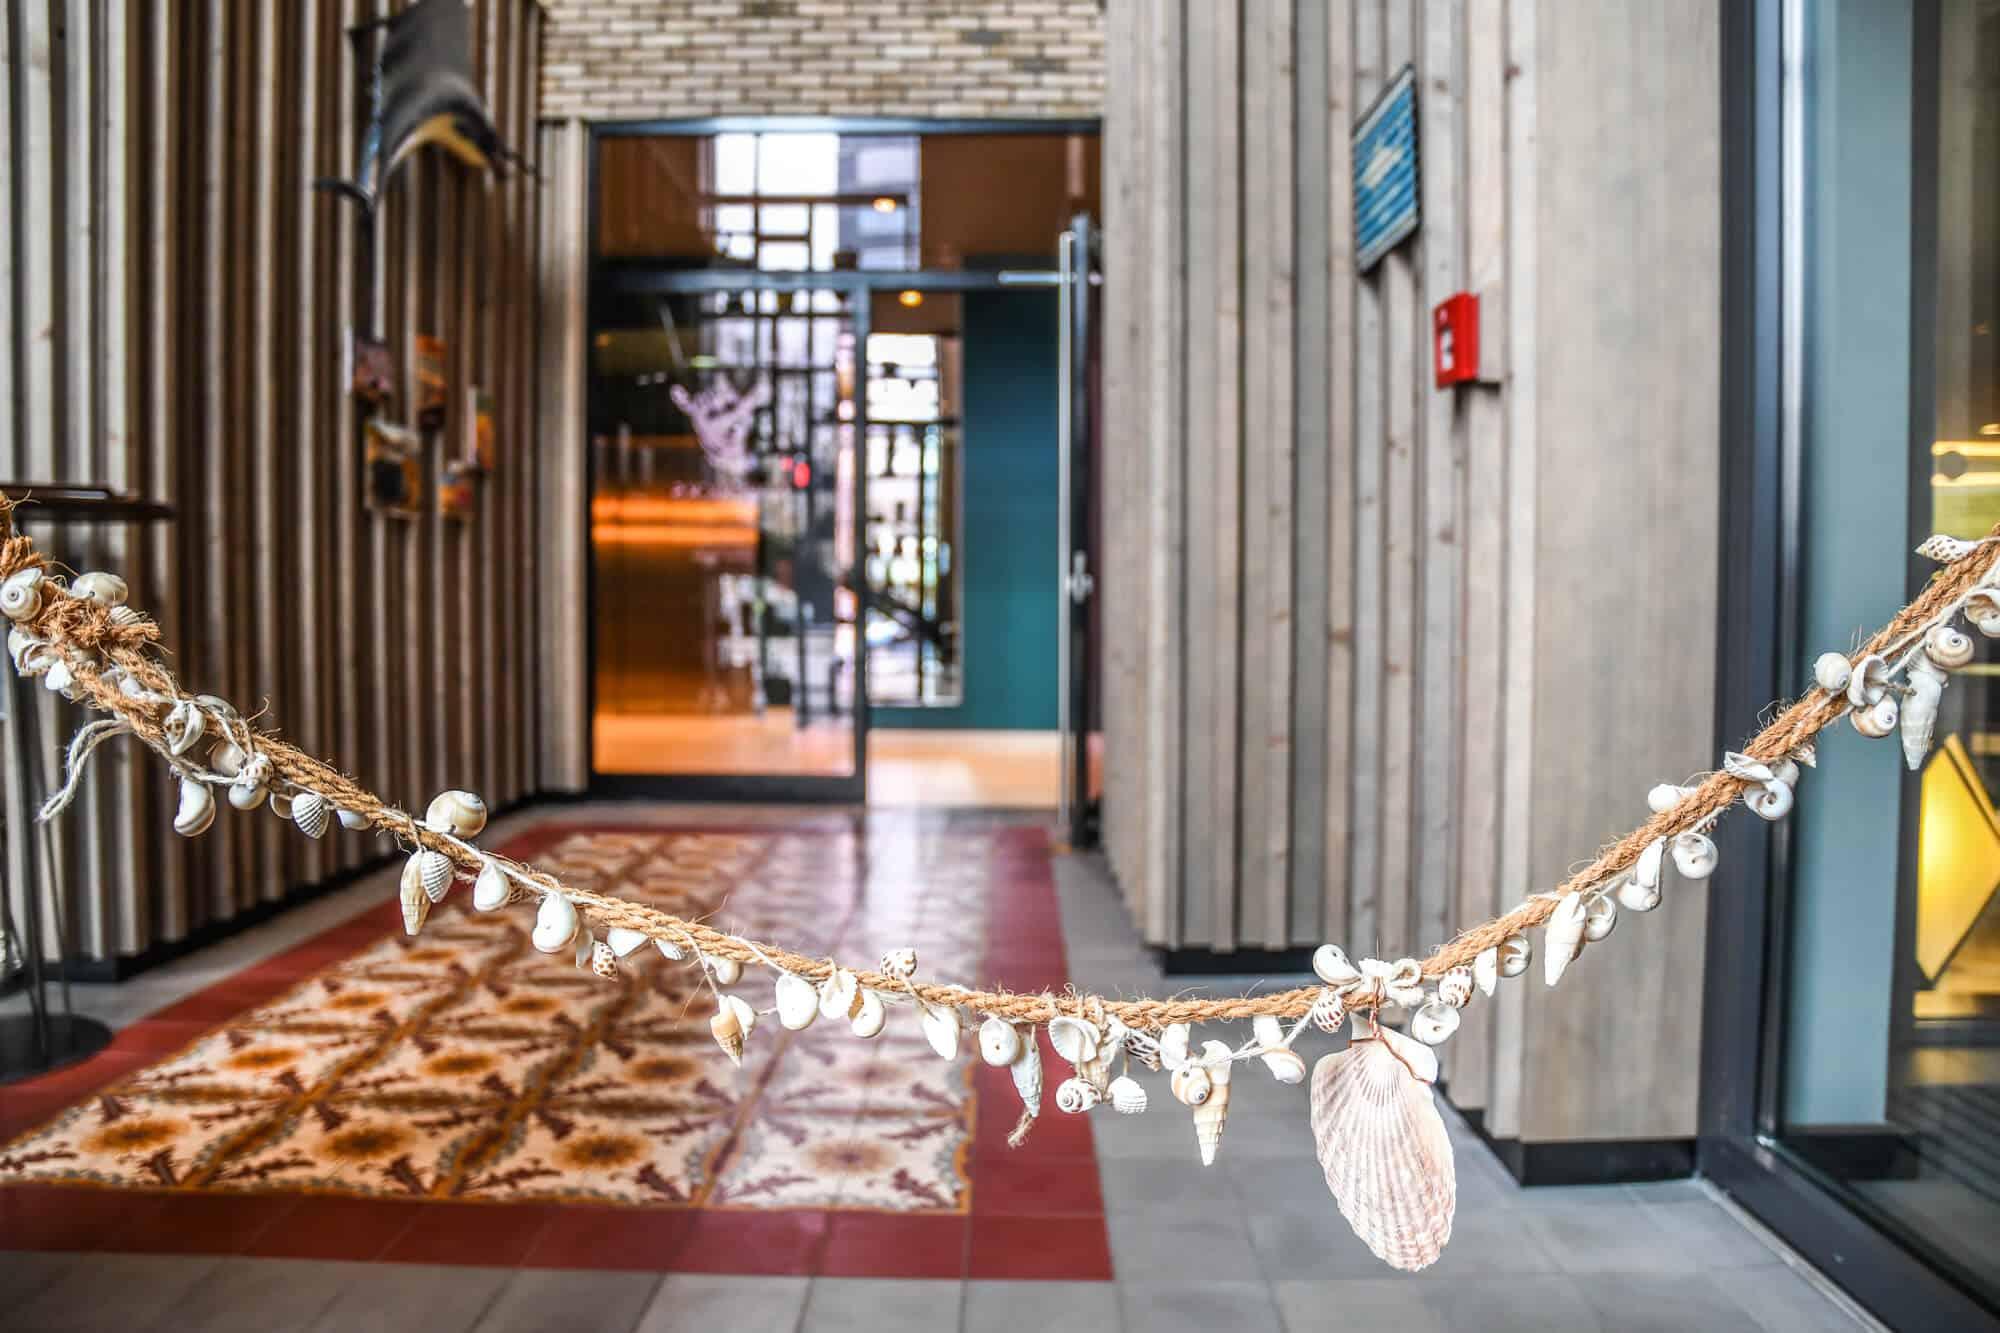 Vienna House Andel's Berlin – Mavericks